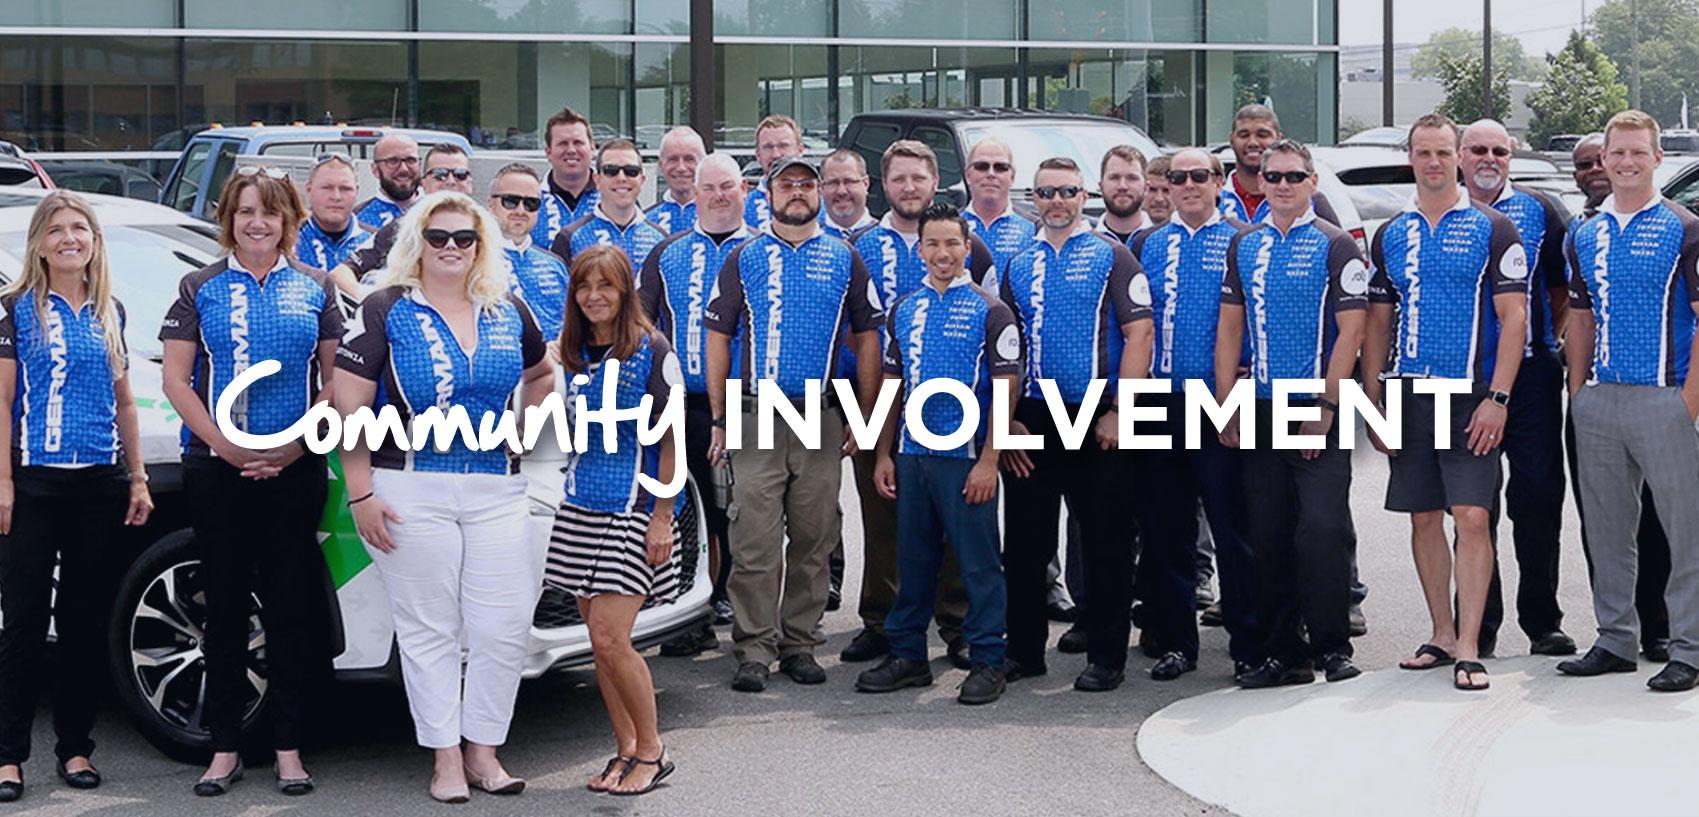 communty-involvement-header-main